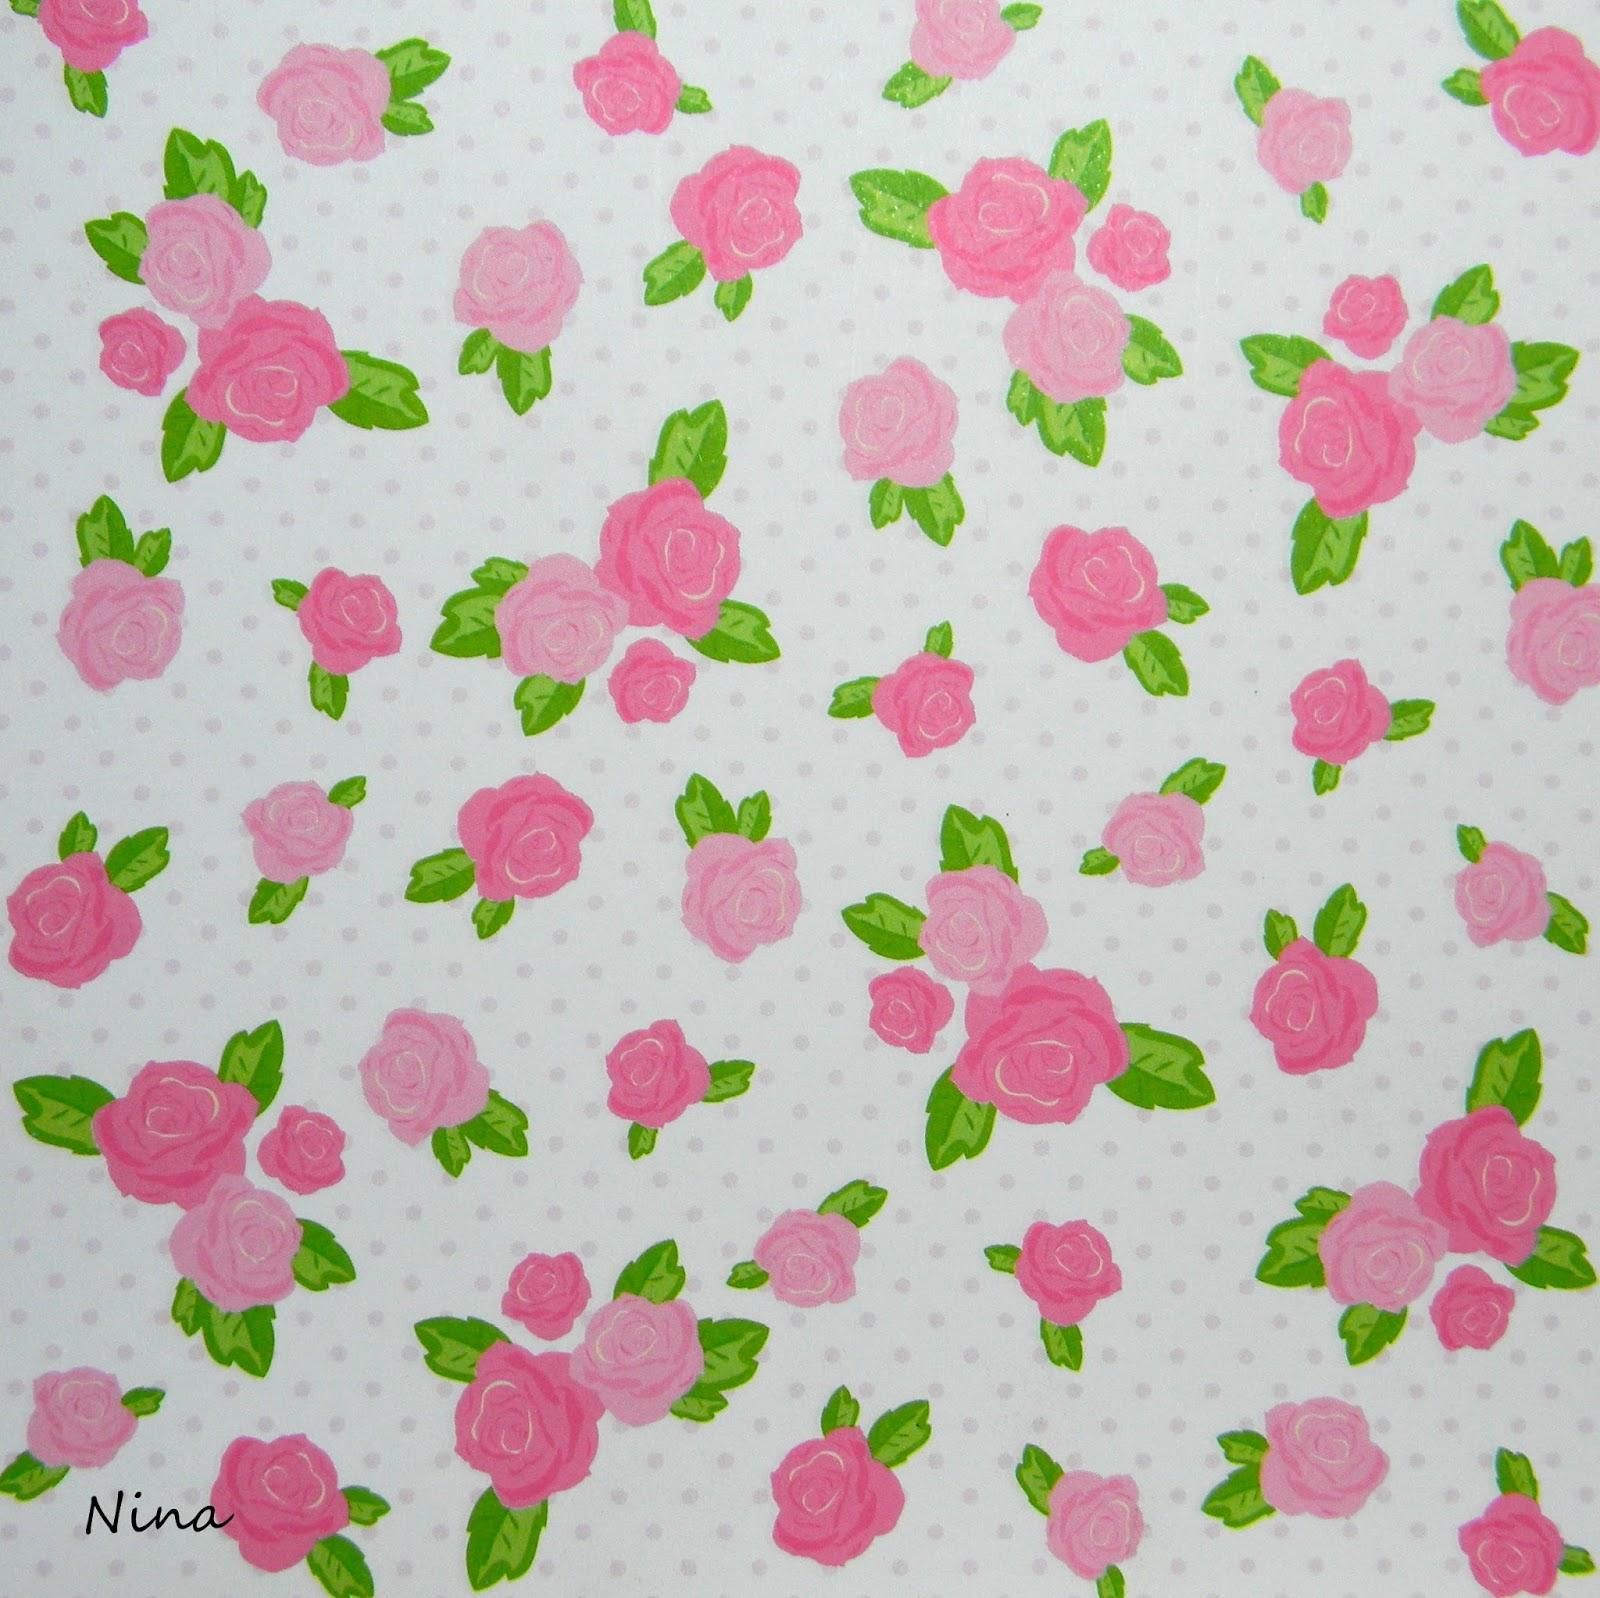 NINA'S RECIPES.....: JAPANESE PAPER ART -ORIGAMI - (FOR MY ... - photo#13